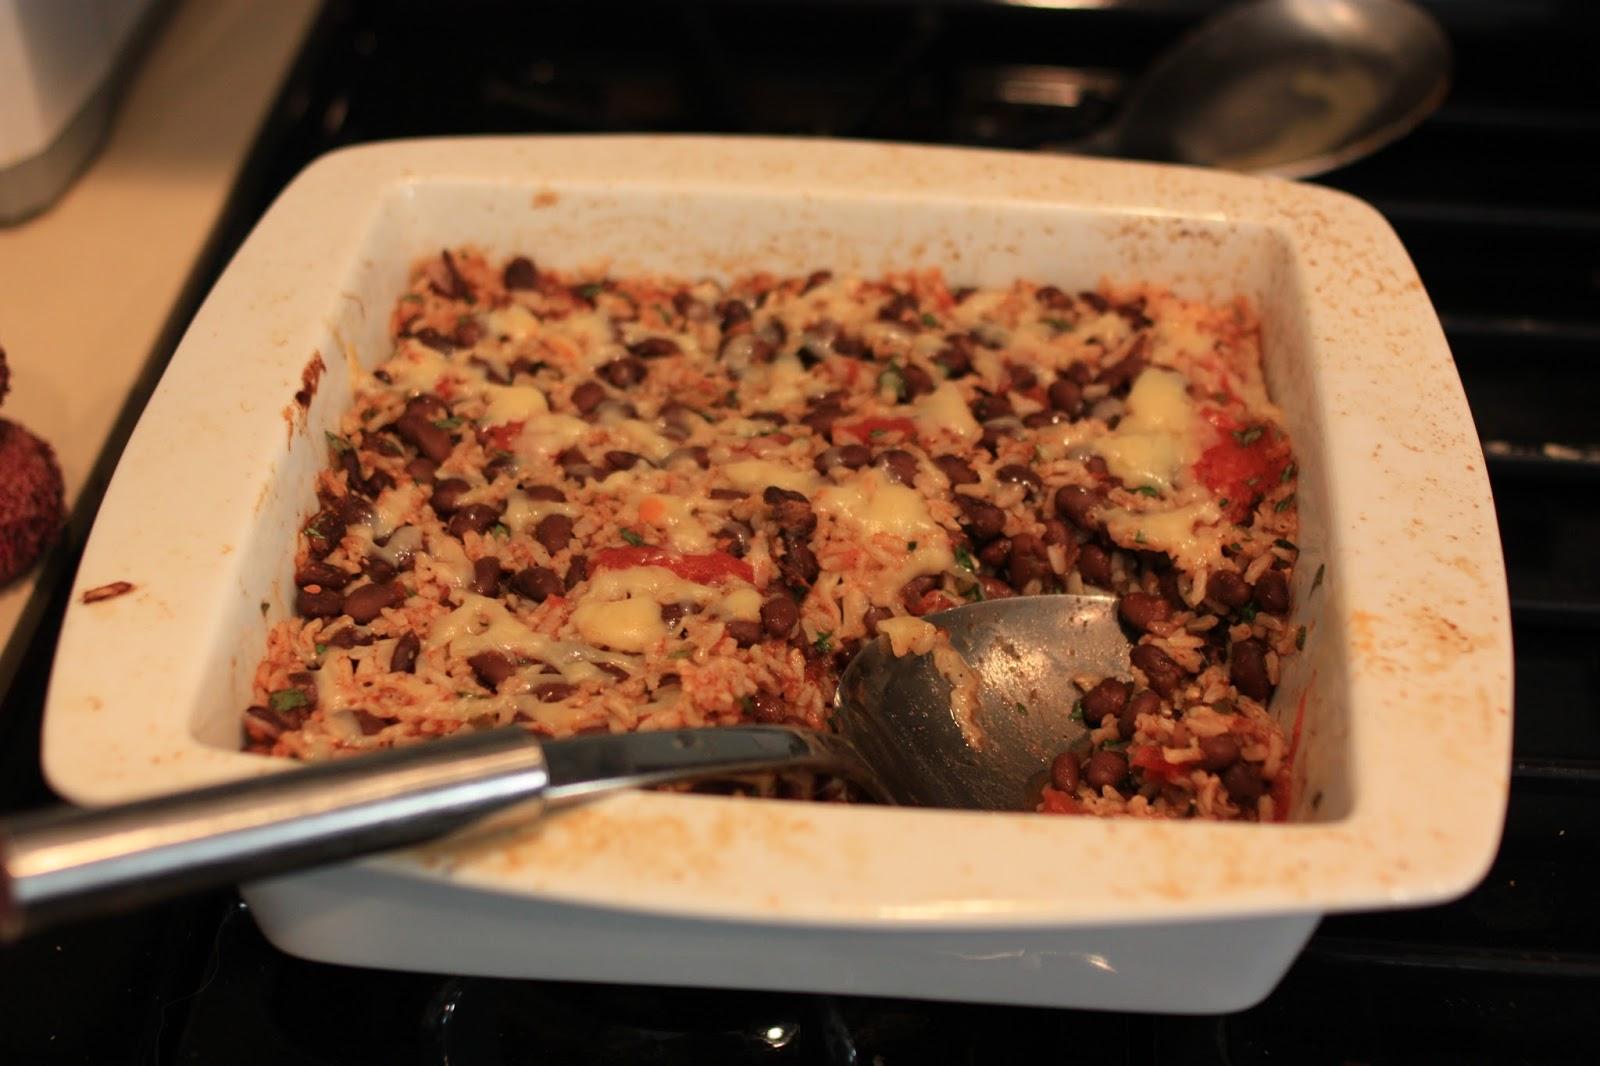 Joie Patisserie: Black Bean and Brown Rice Casserole